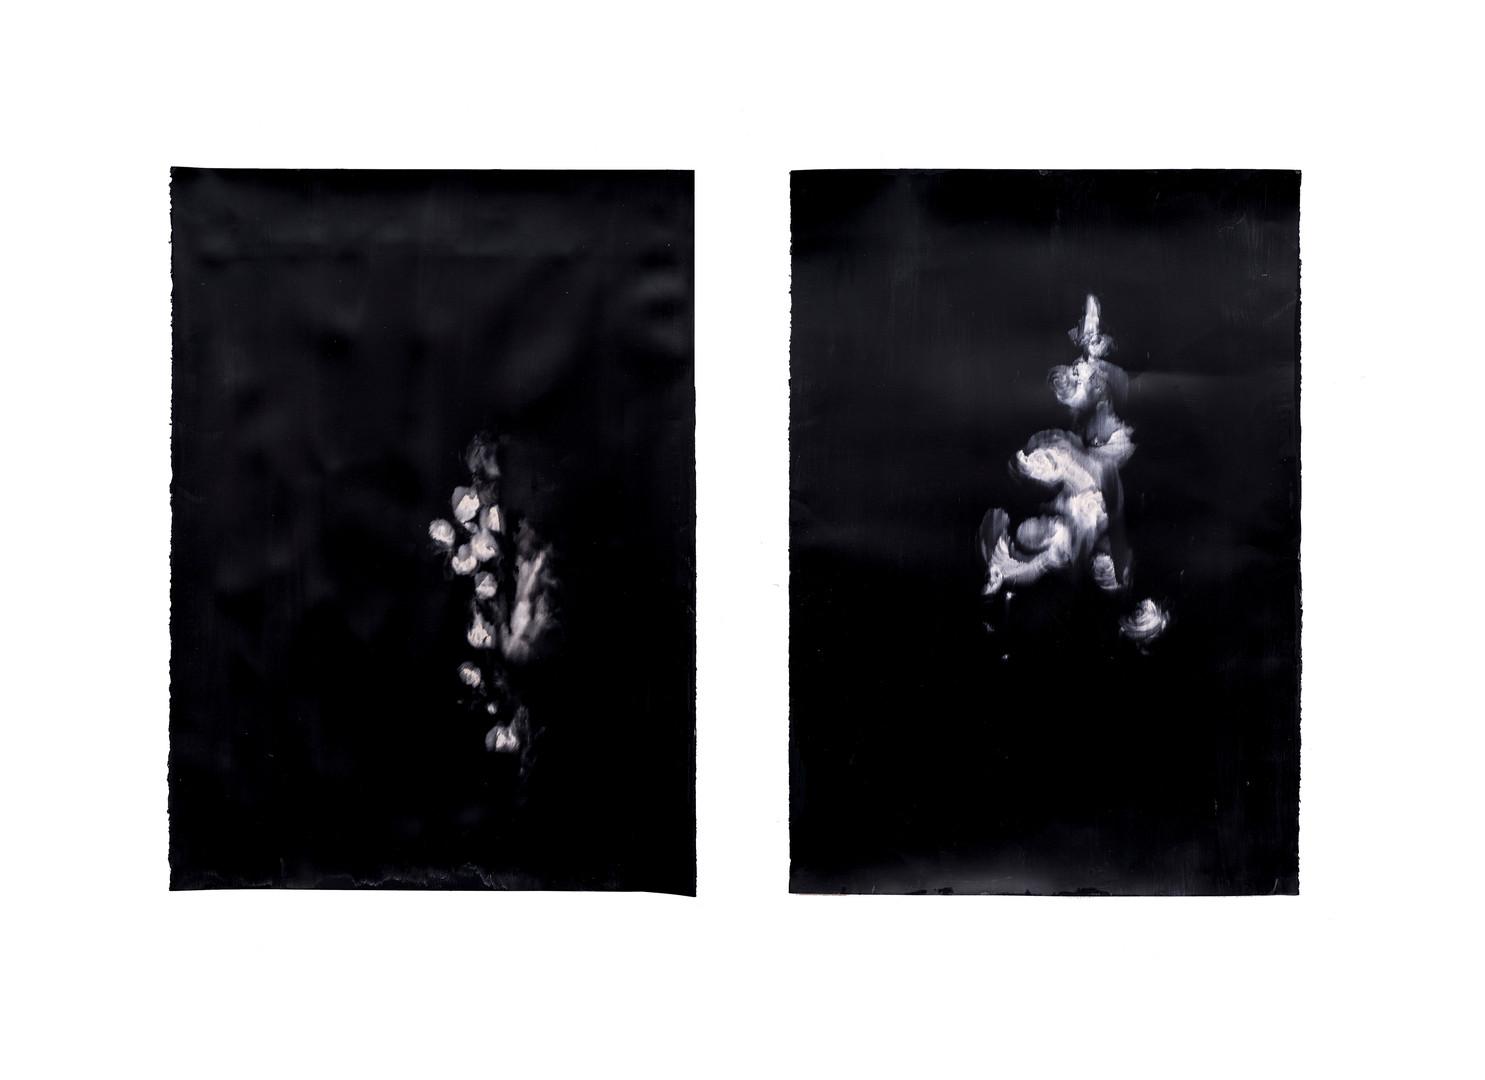 Alexandra Karakashian   Against The Sun IX, XXII   2019   Oil on Sized Paper   100 x 70 cm (each)